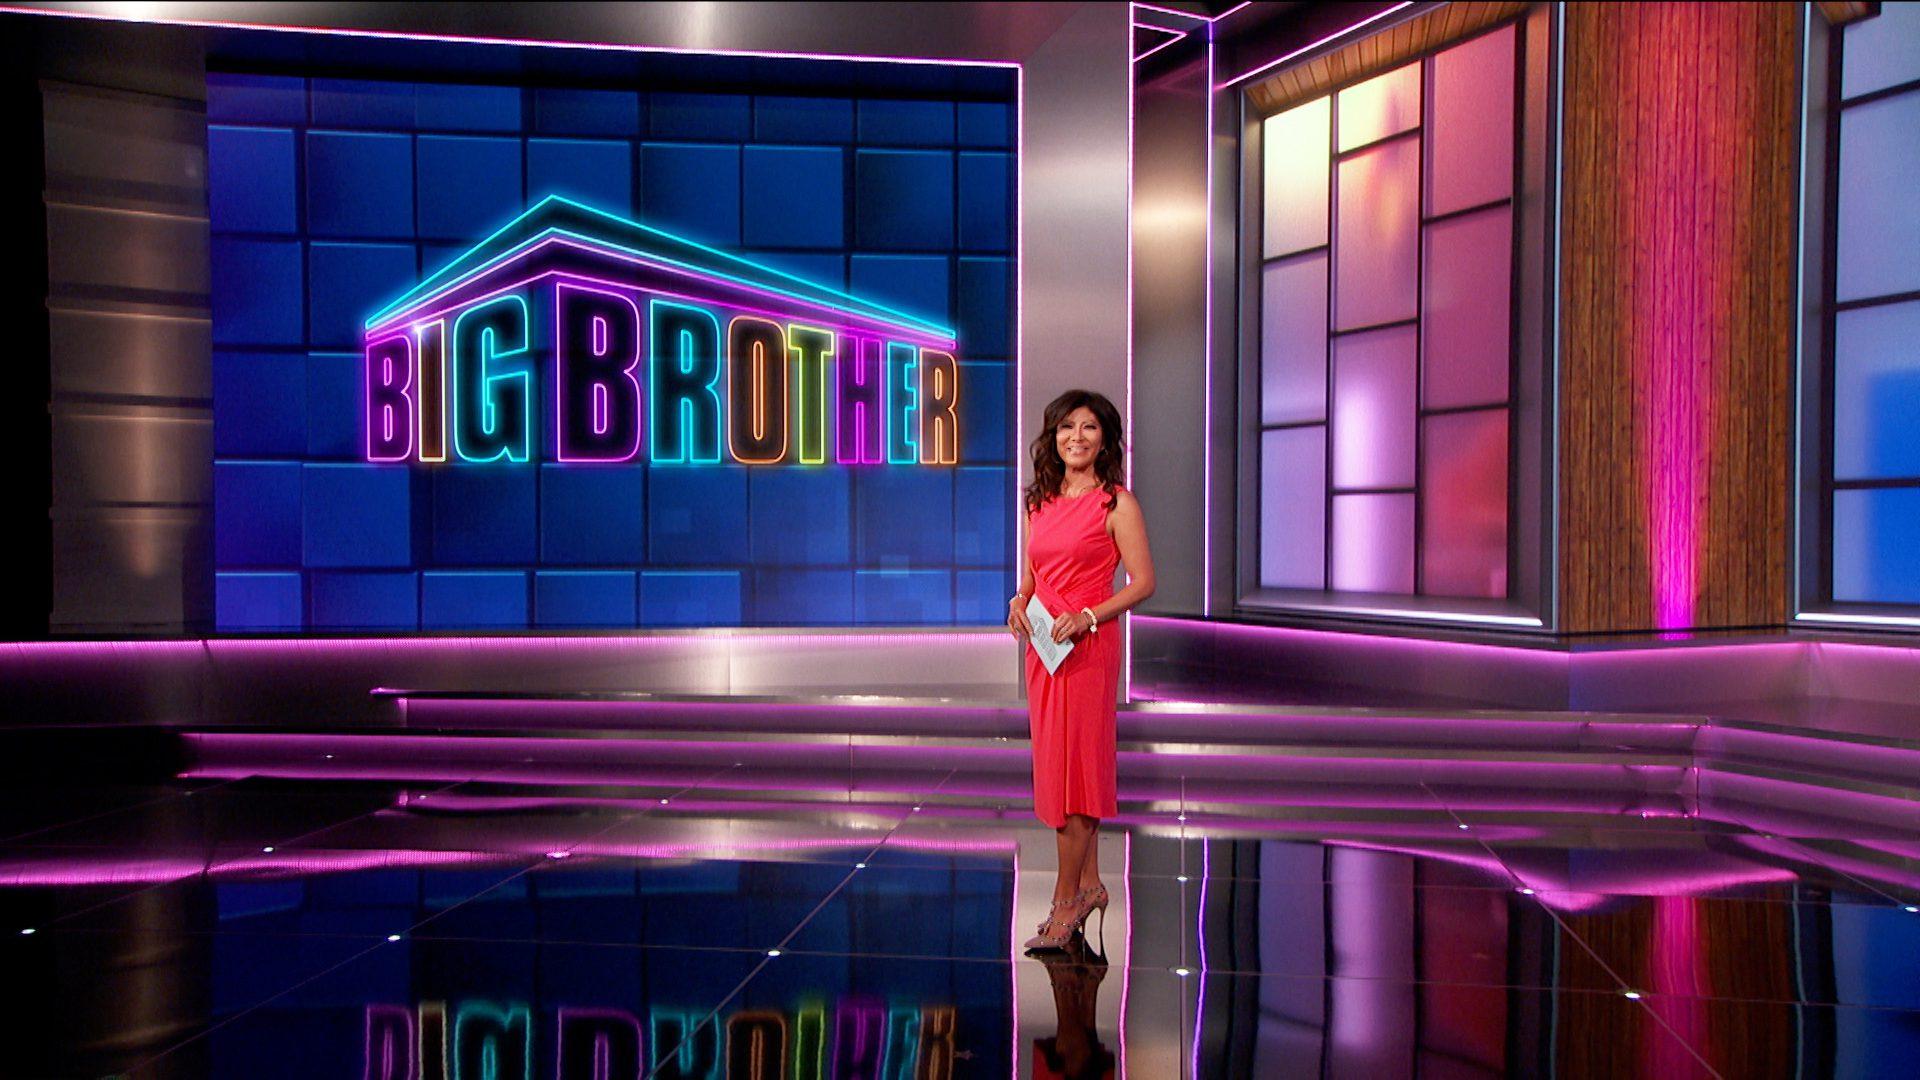 Big Brother Season 23 Episode 12